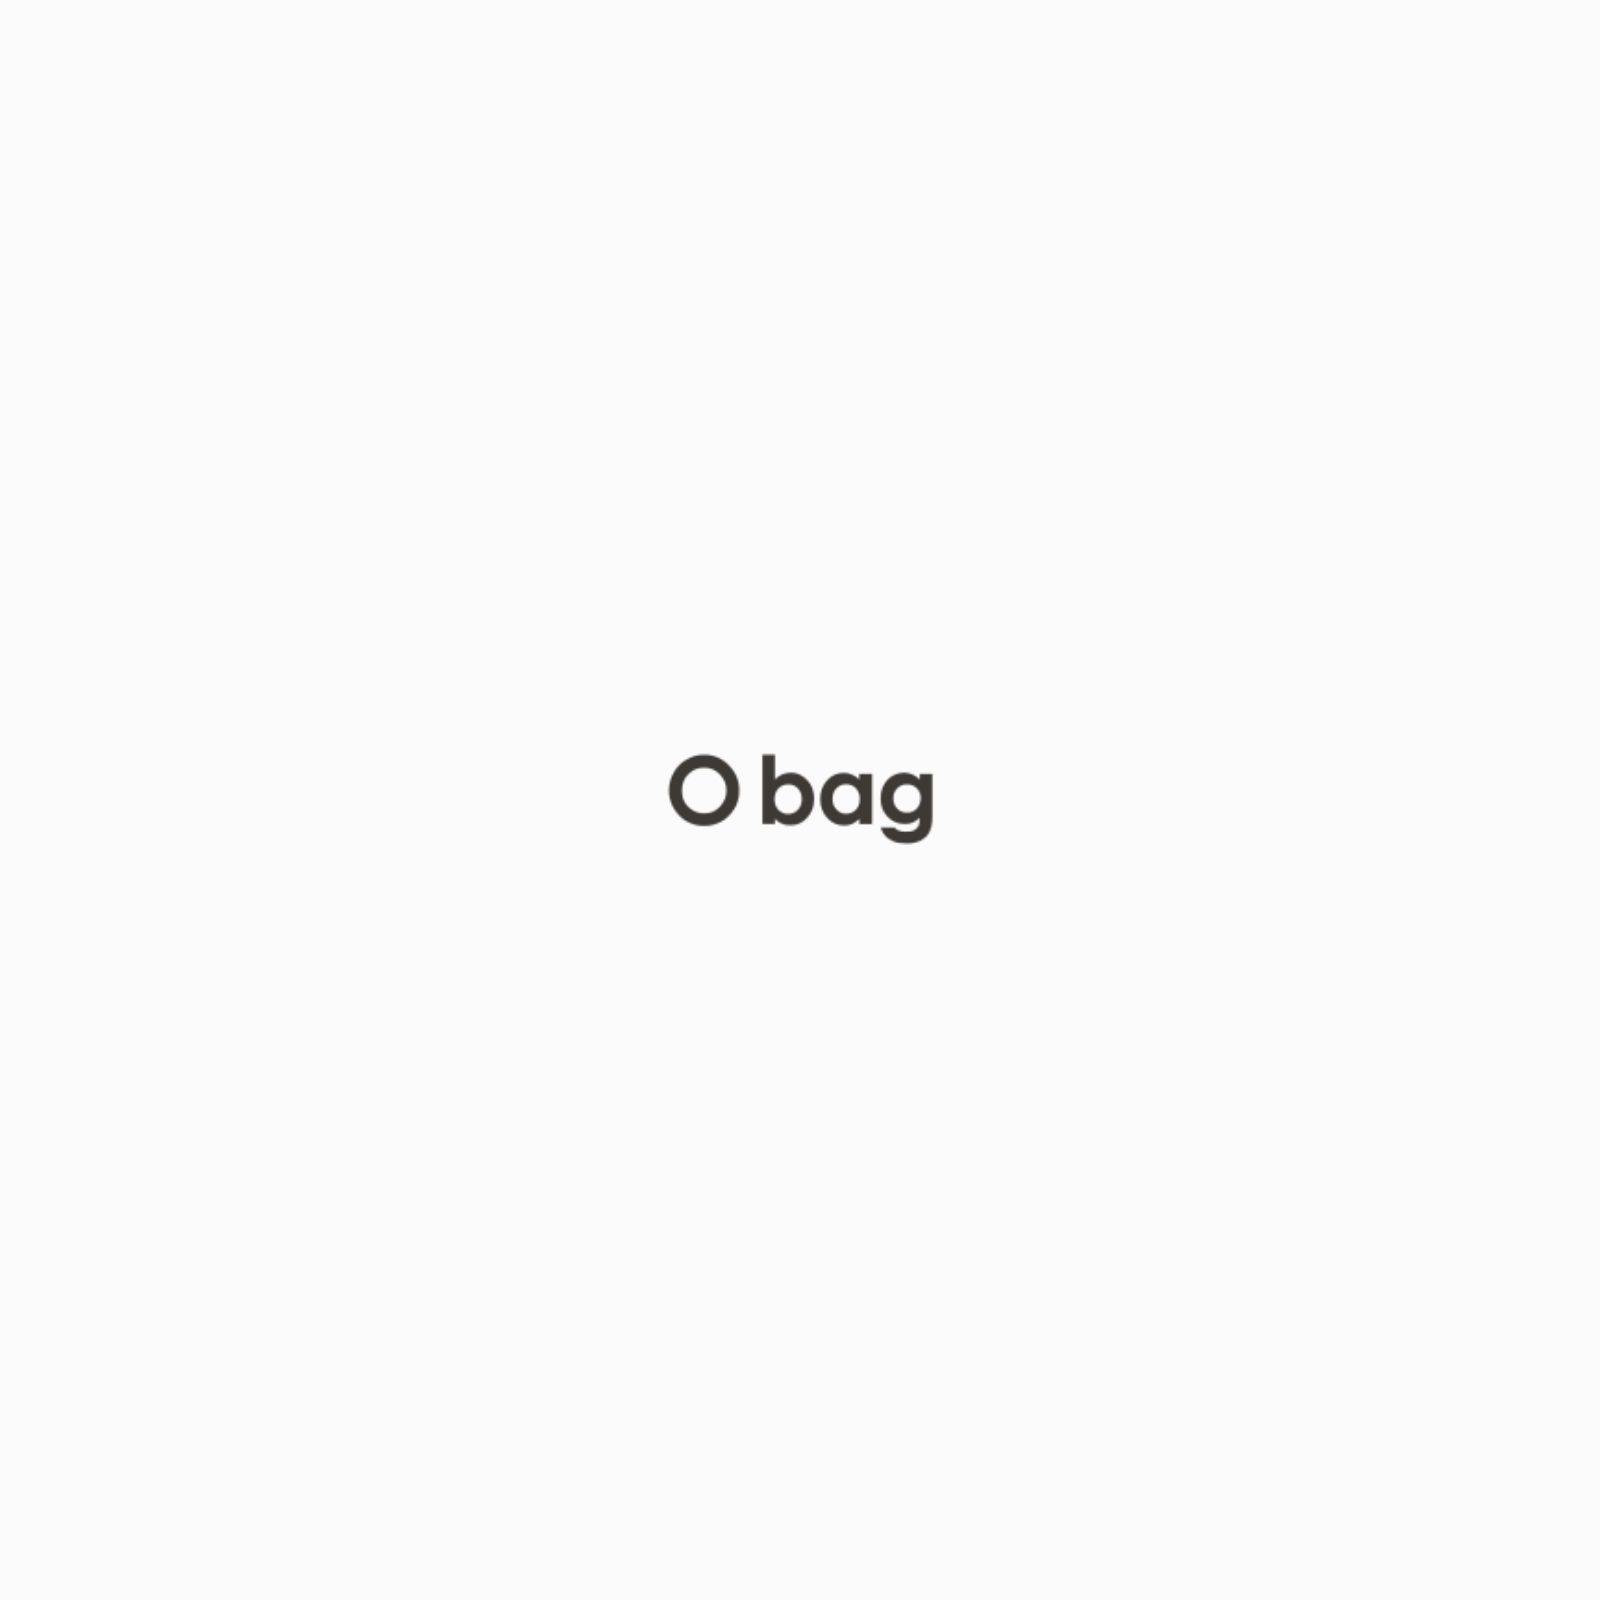 40caf06843866 O bag O bag nera with trim in wool cloth fabric maxi check